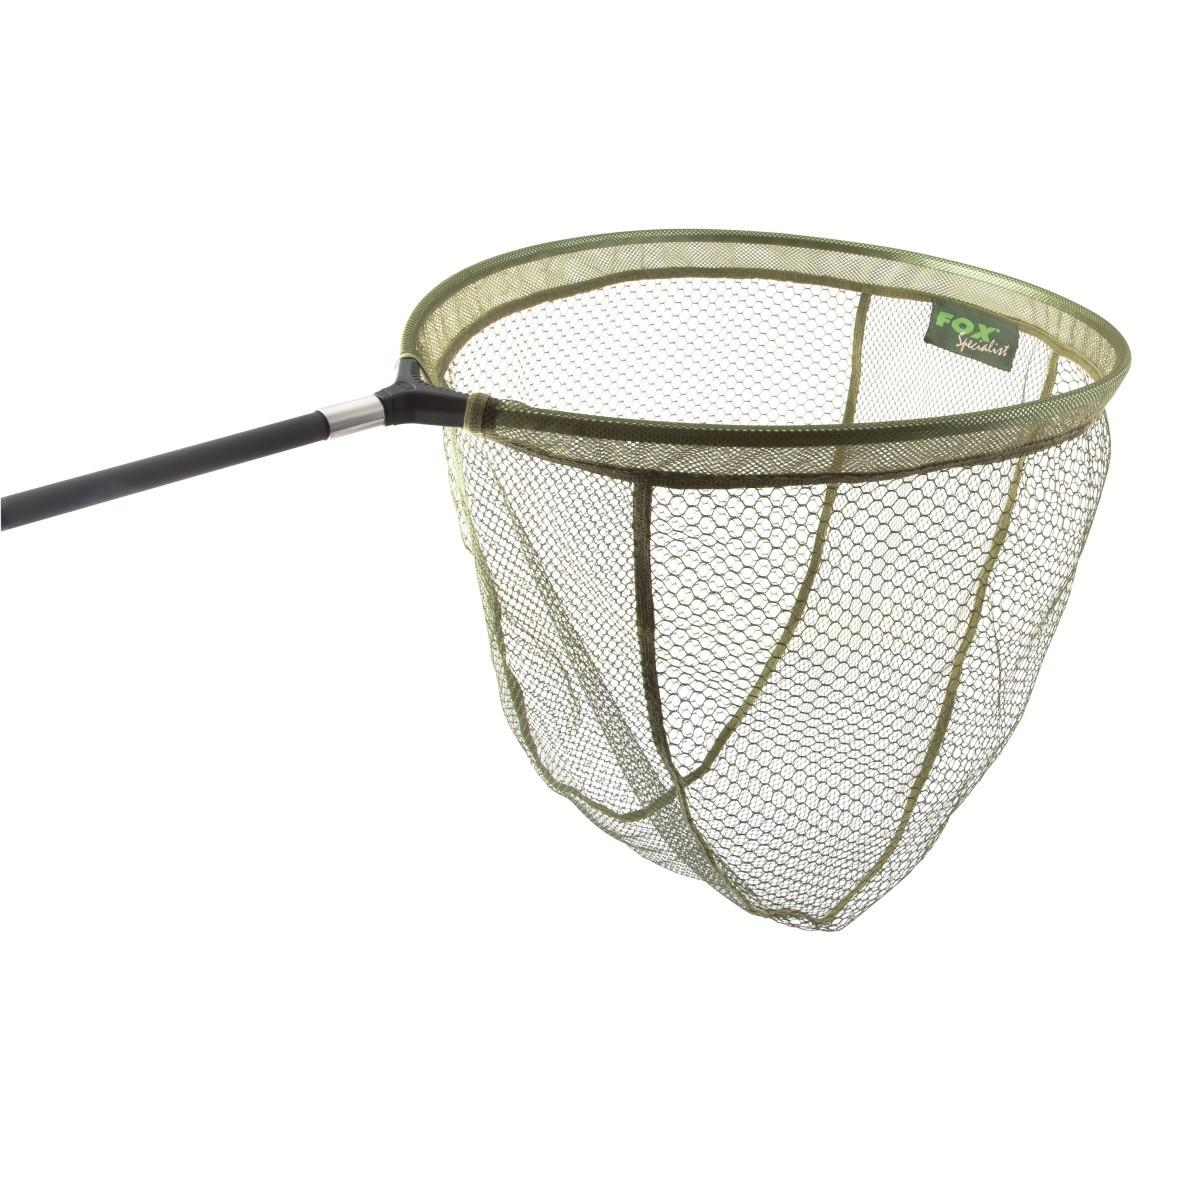 Глава за кеп Fox Specialist Landing Net MK2 24 inch